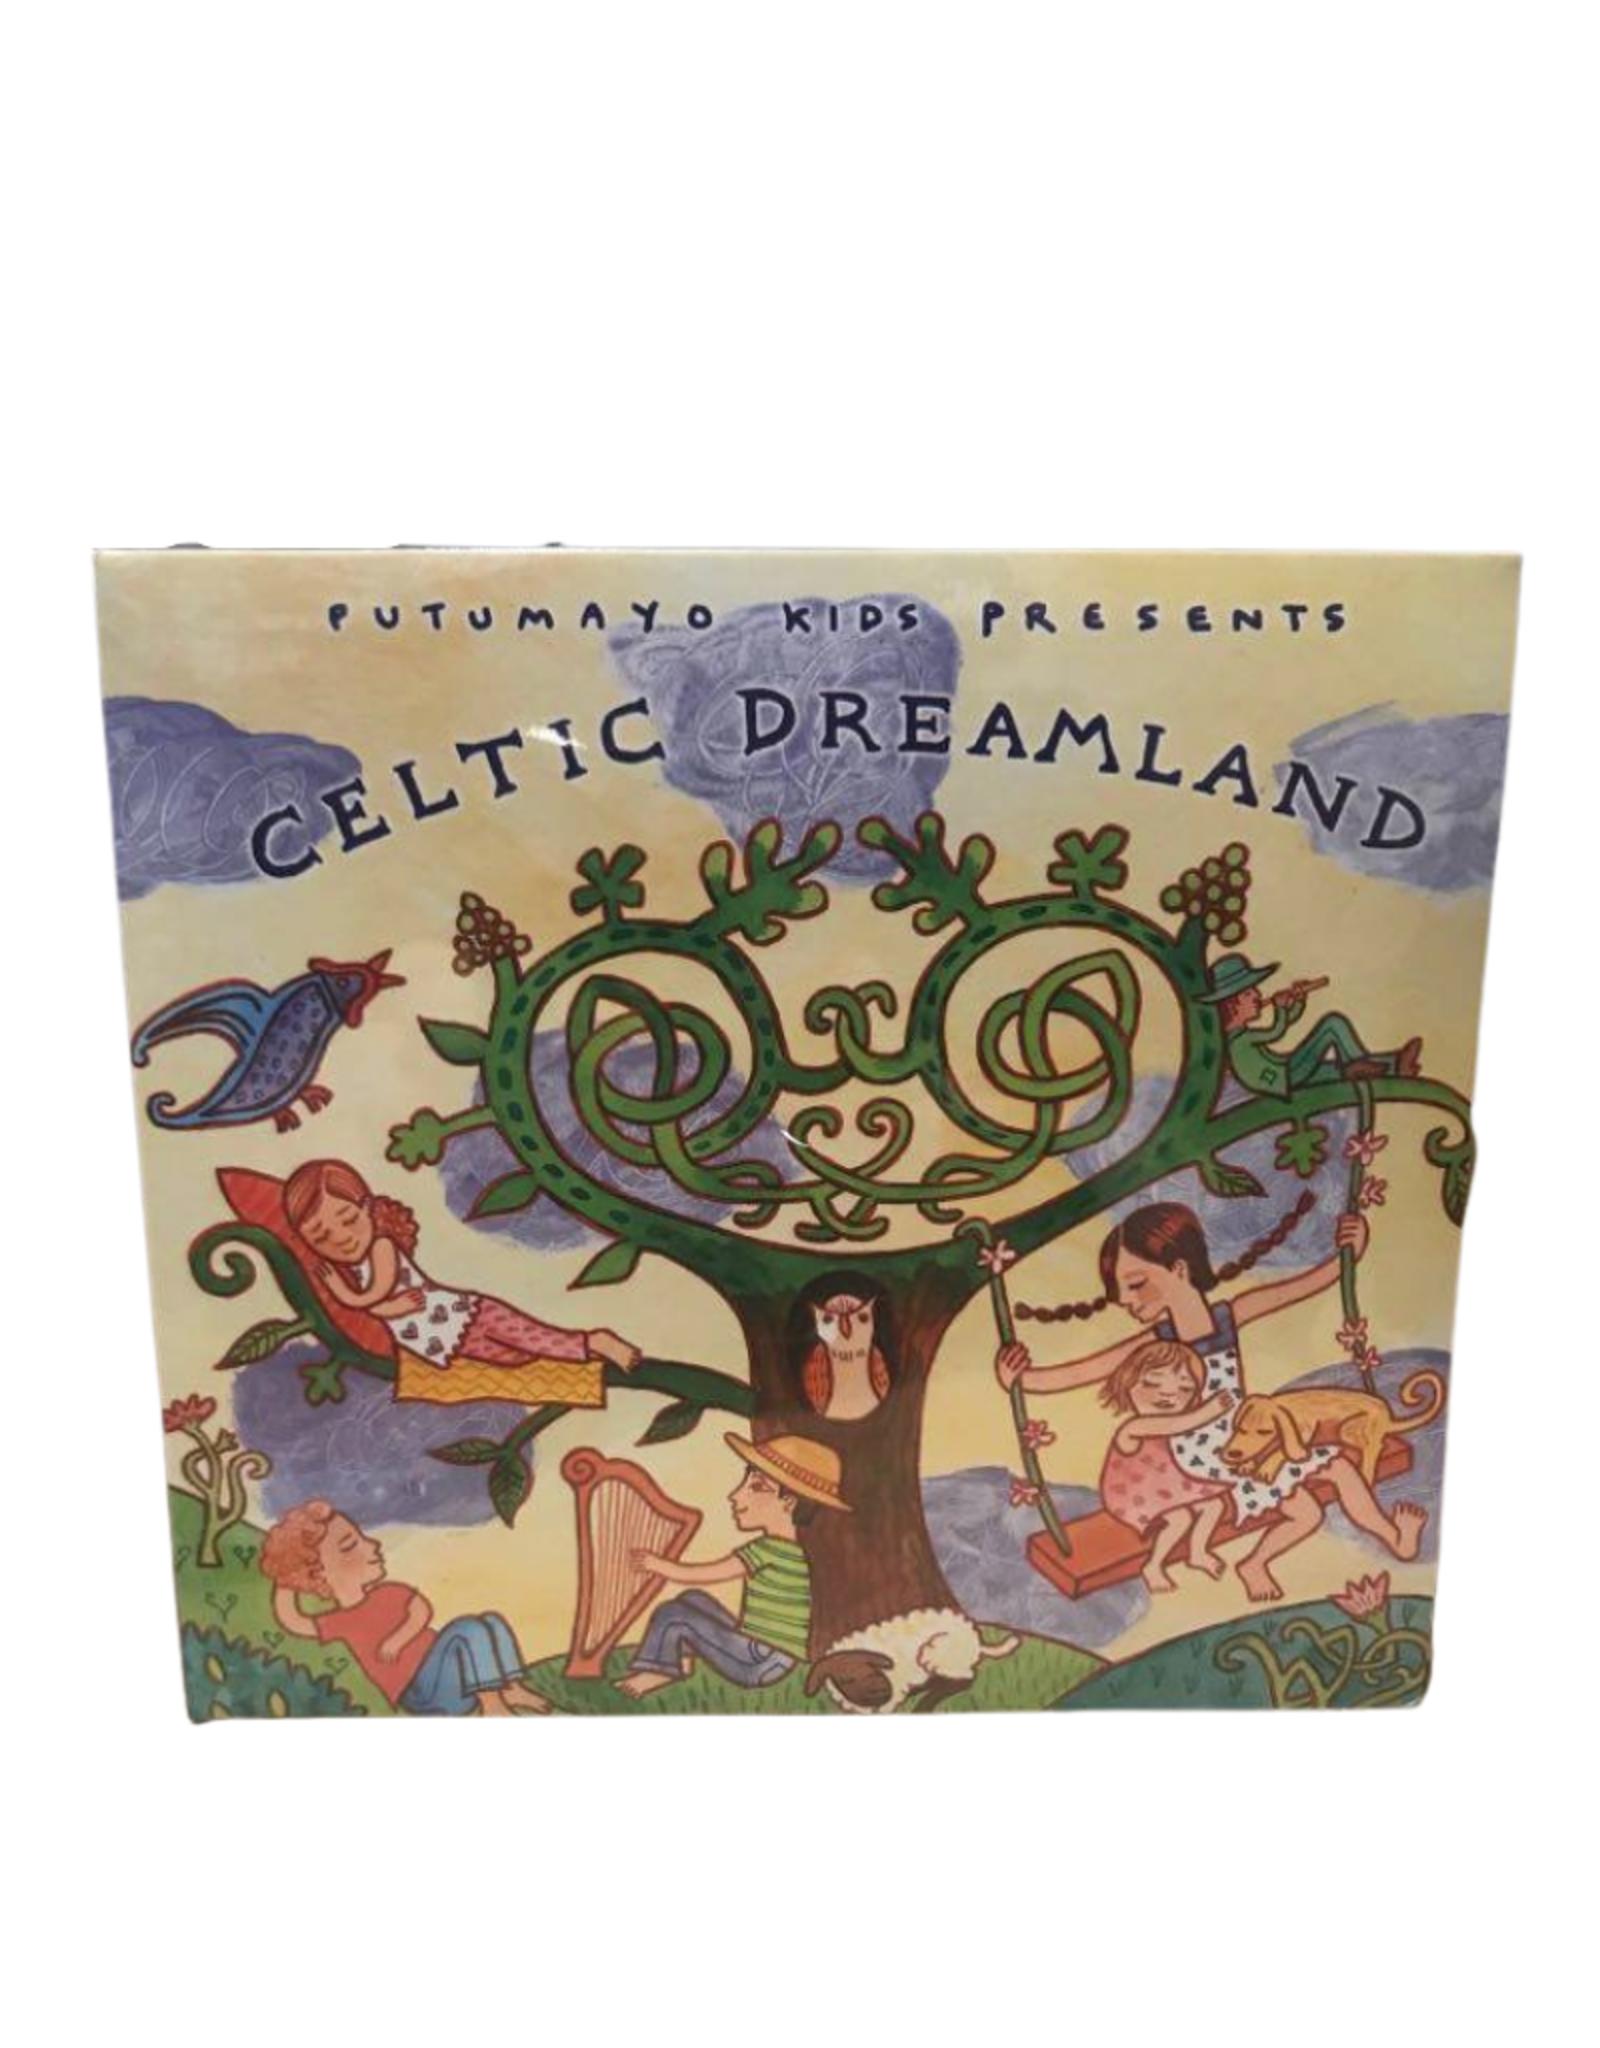 CD Putumayo Celtic Dreamland